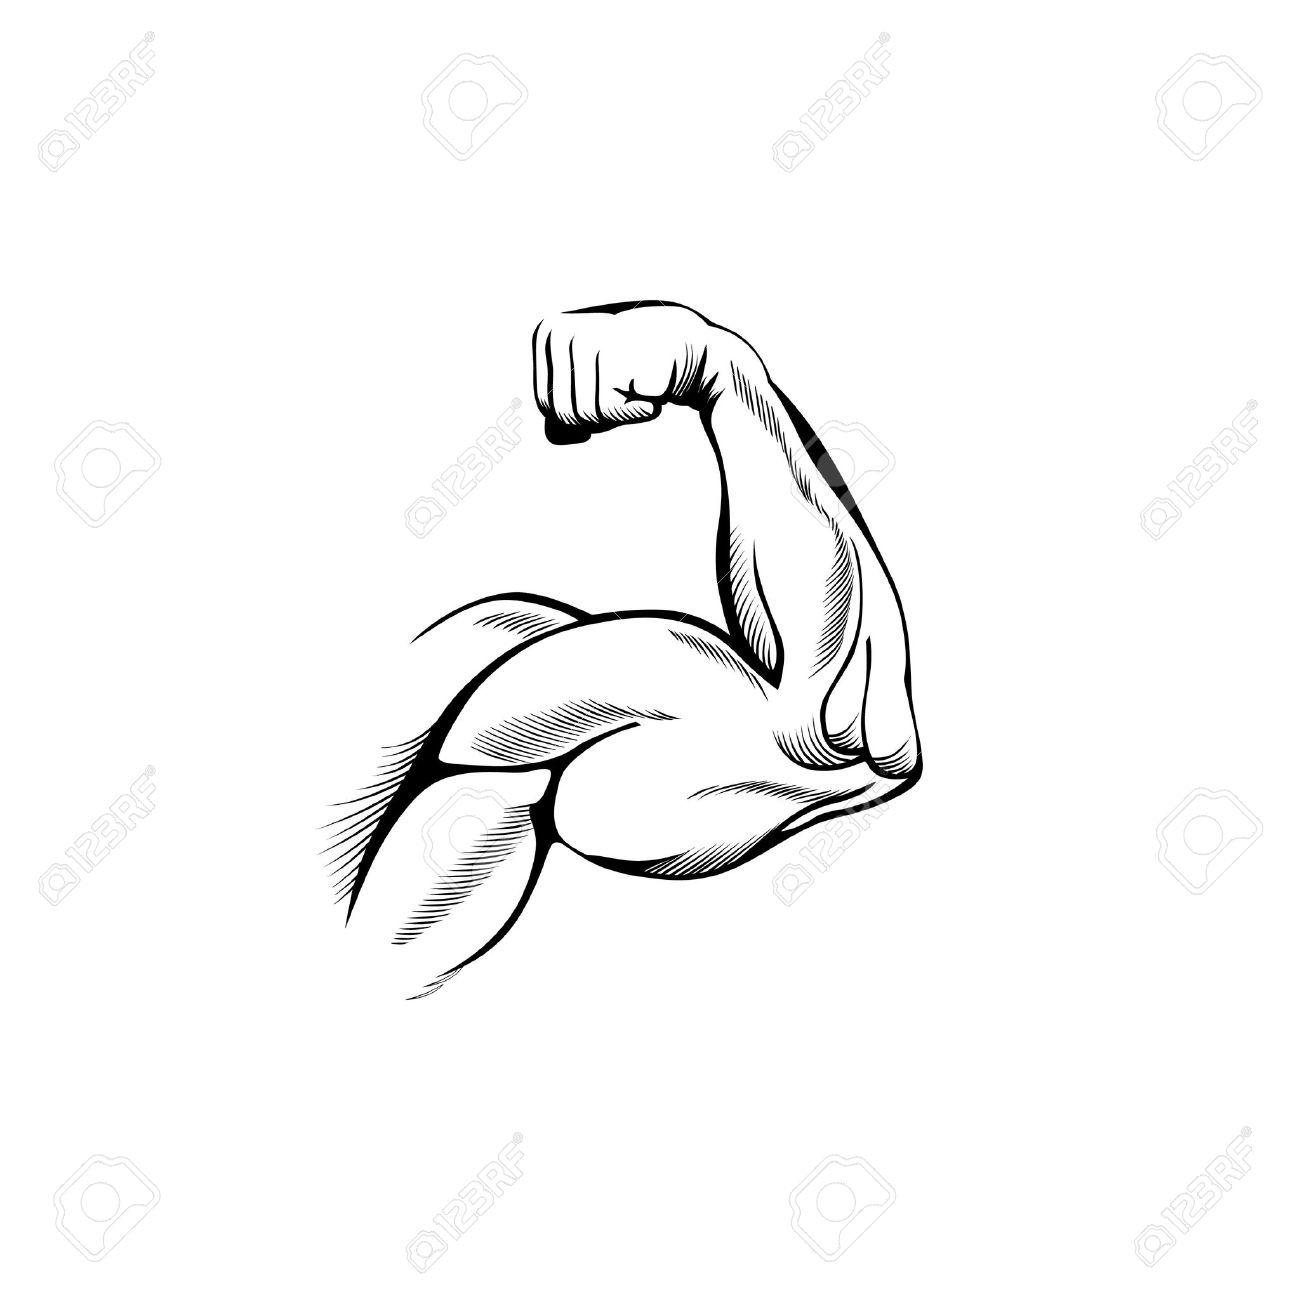 on white   biceps  body  Flexing Bicep Drawing